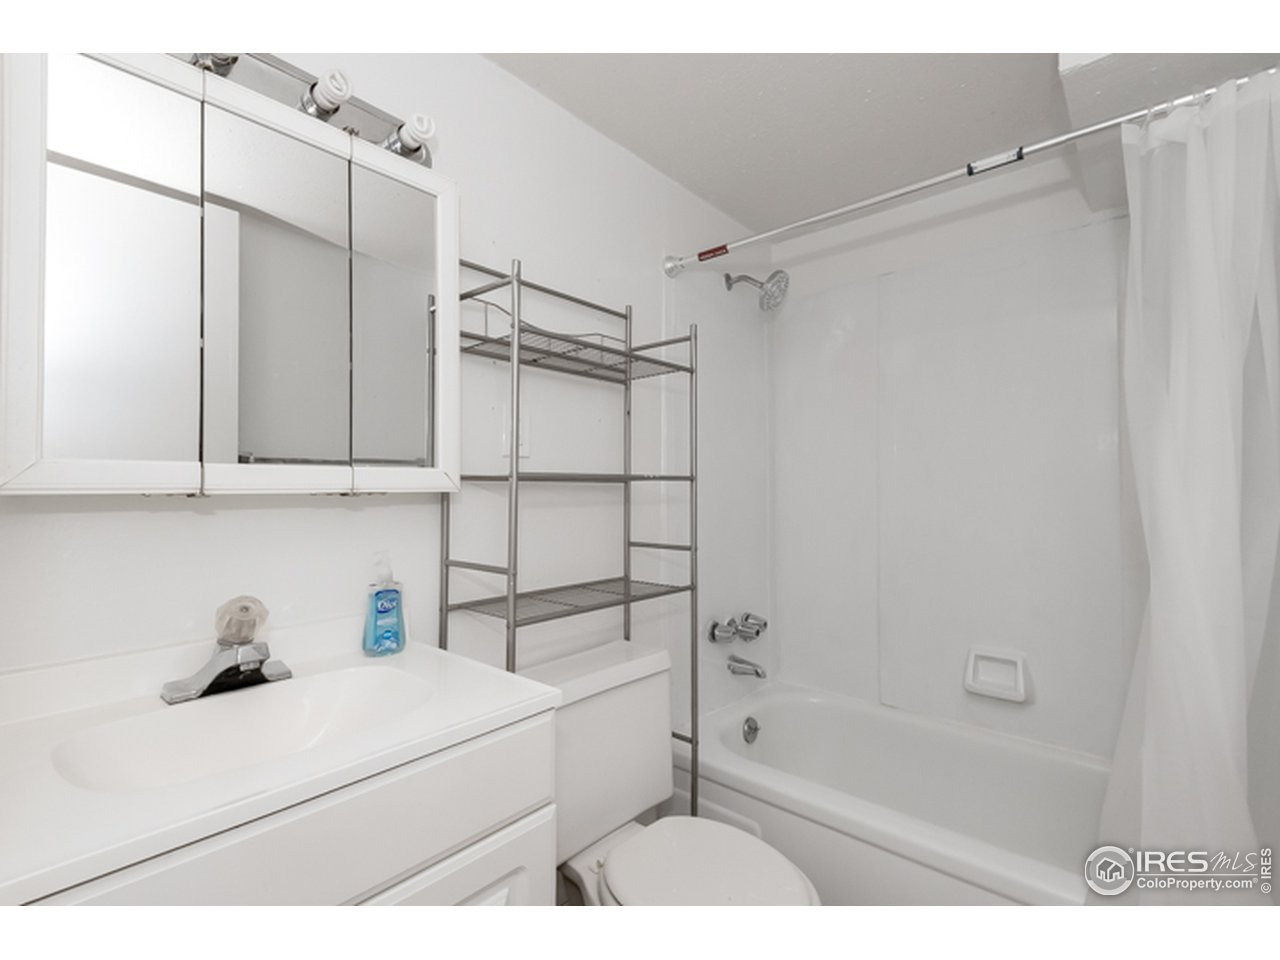 The basement bathroom